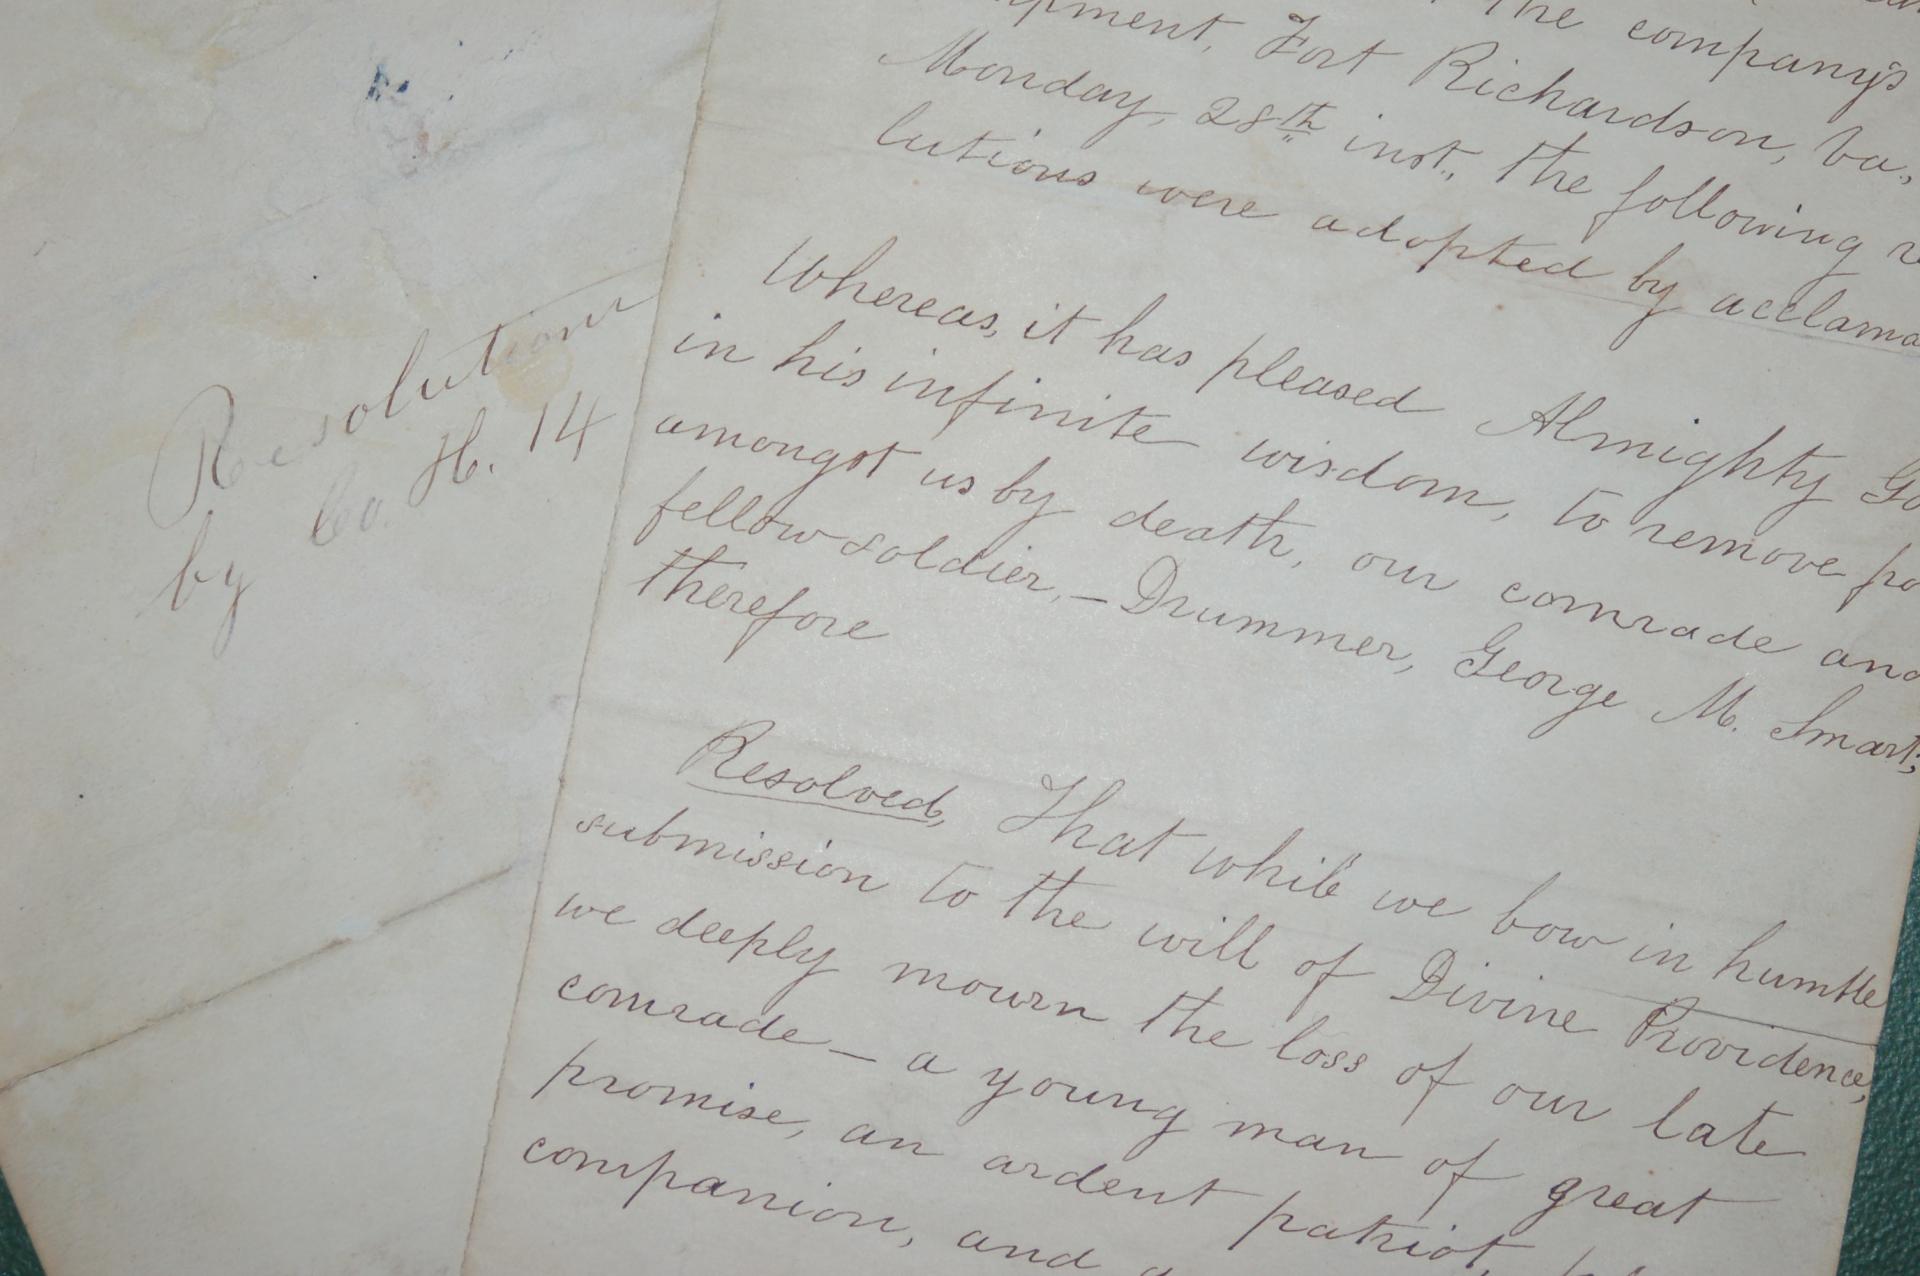 Regimental Resolution upon the death of George Smart